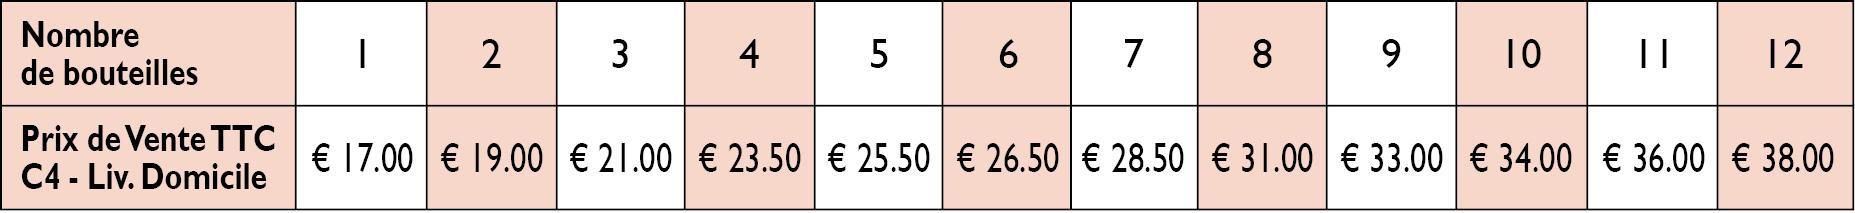 Home delivery rates in Switzerland, Andorra, Norway, Liechtenstein, Gibraltar and Iceland from 1 to 12 bottles